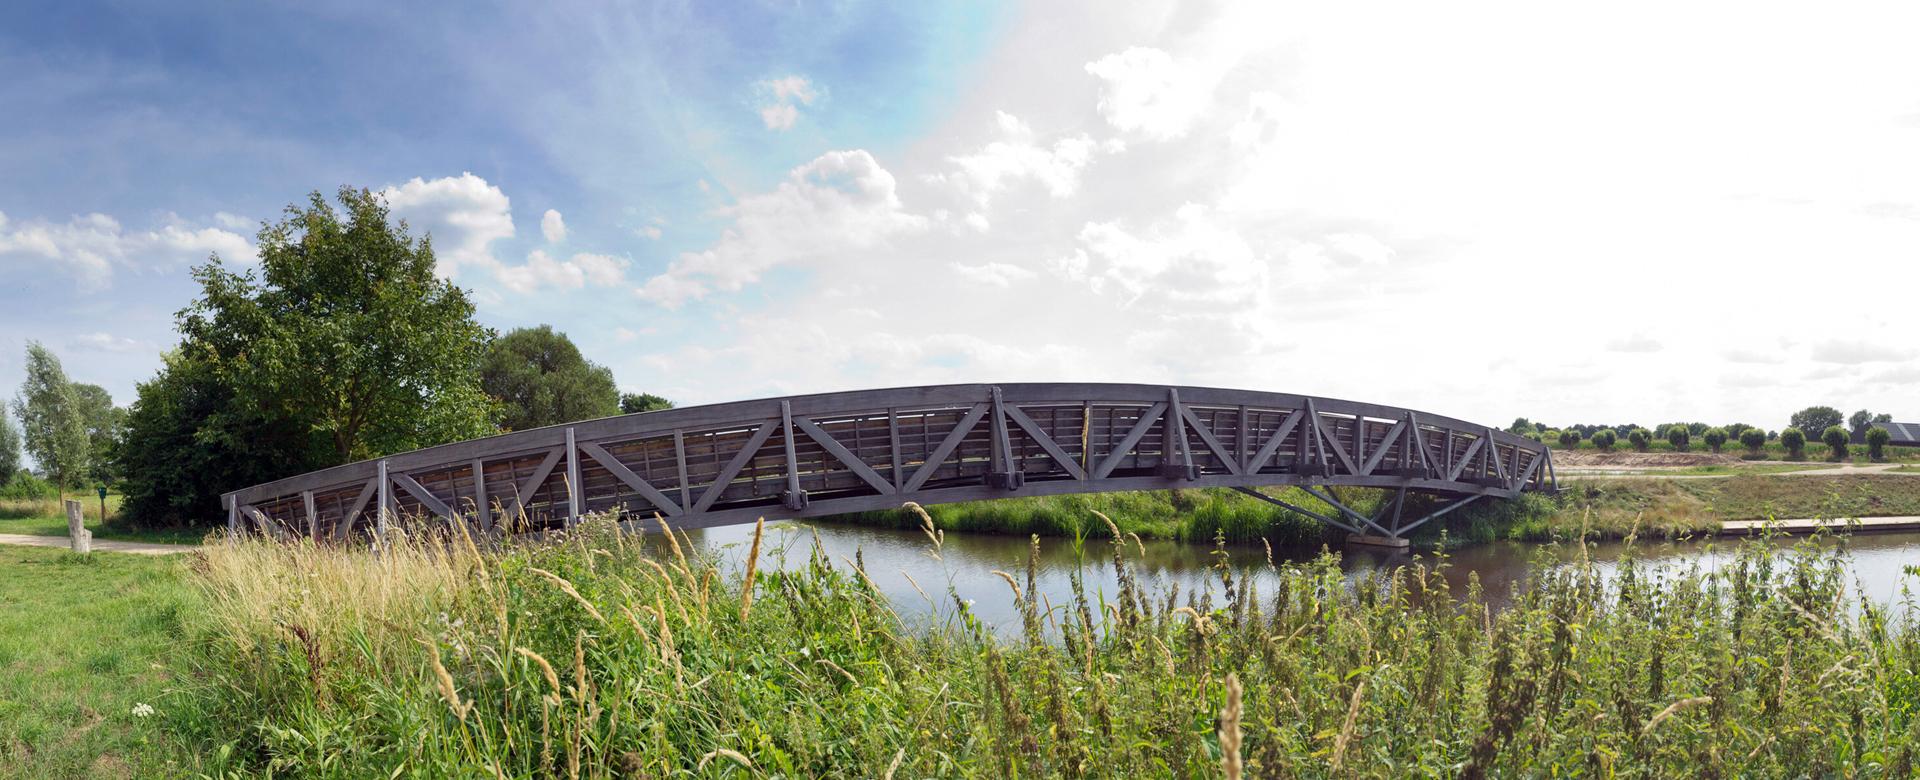 houten vakwerkbrug Engbergen